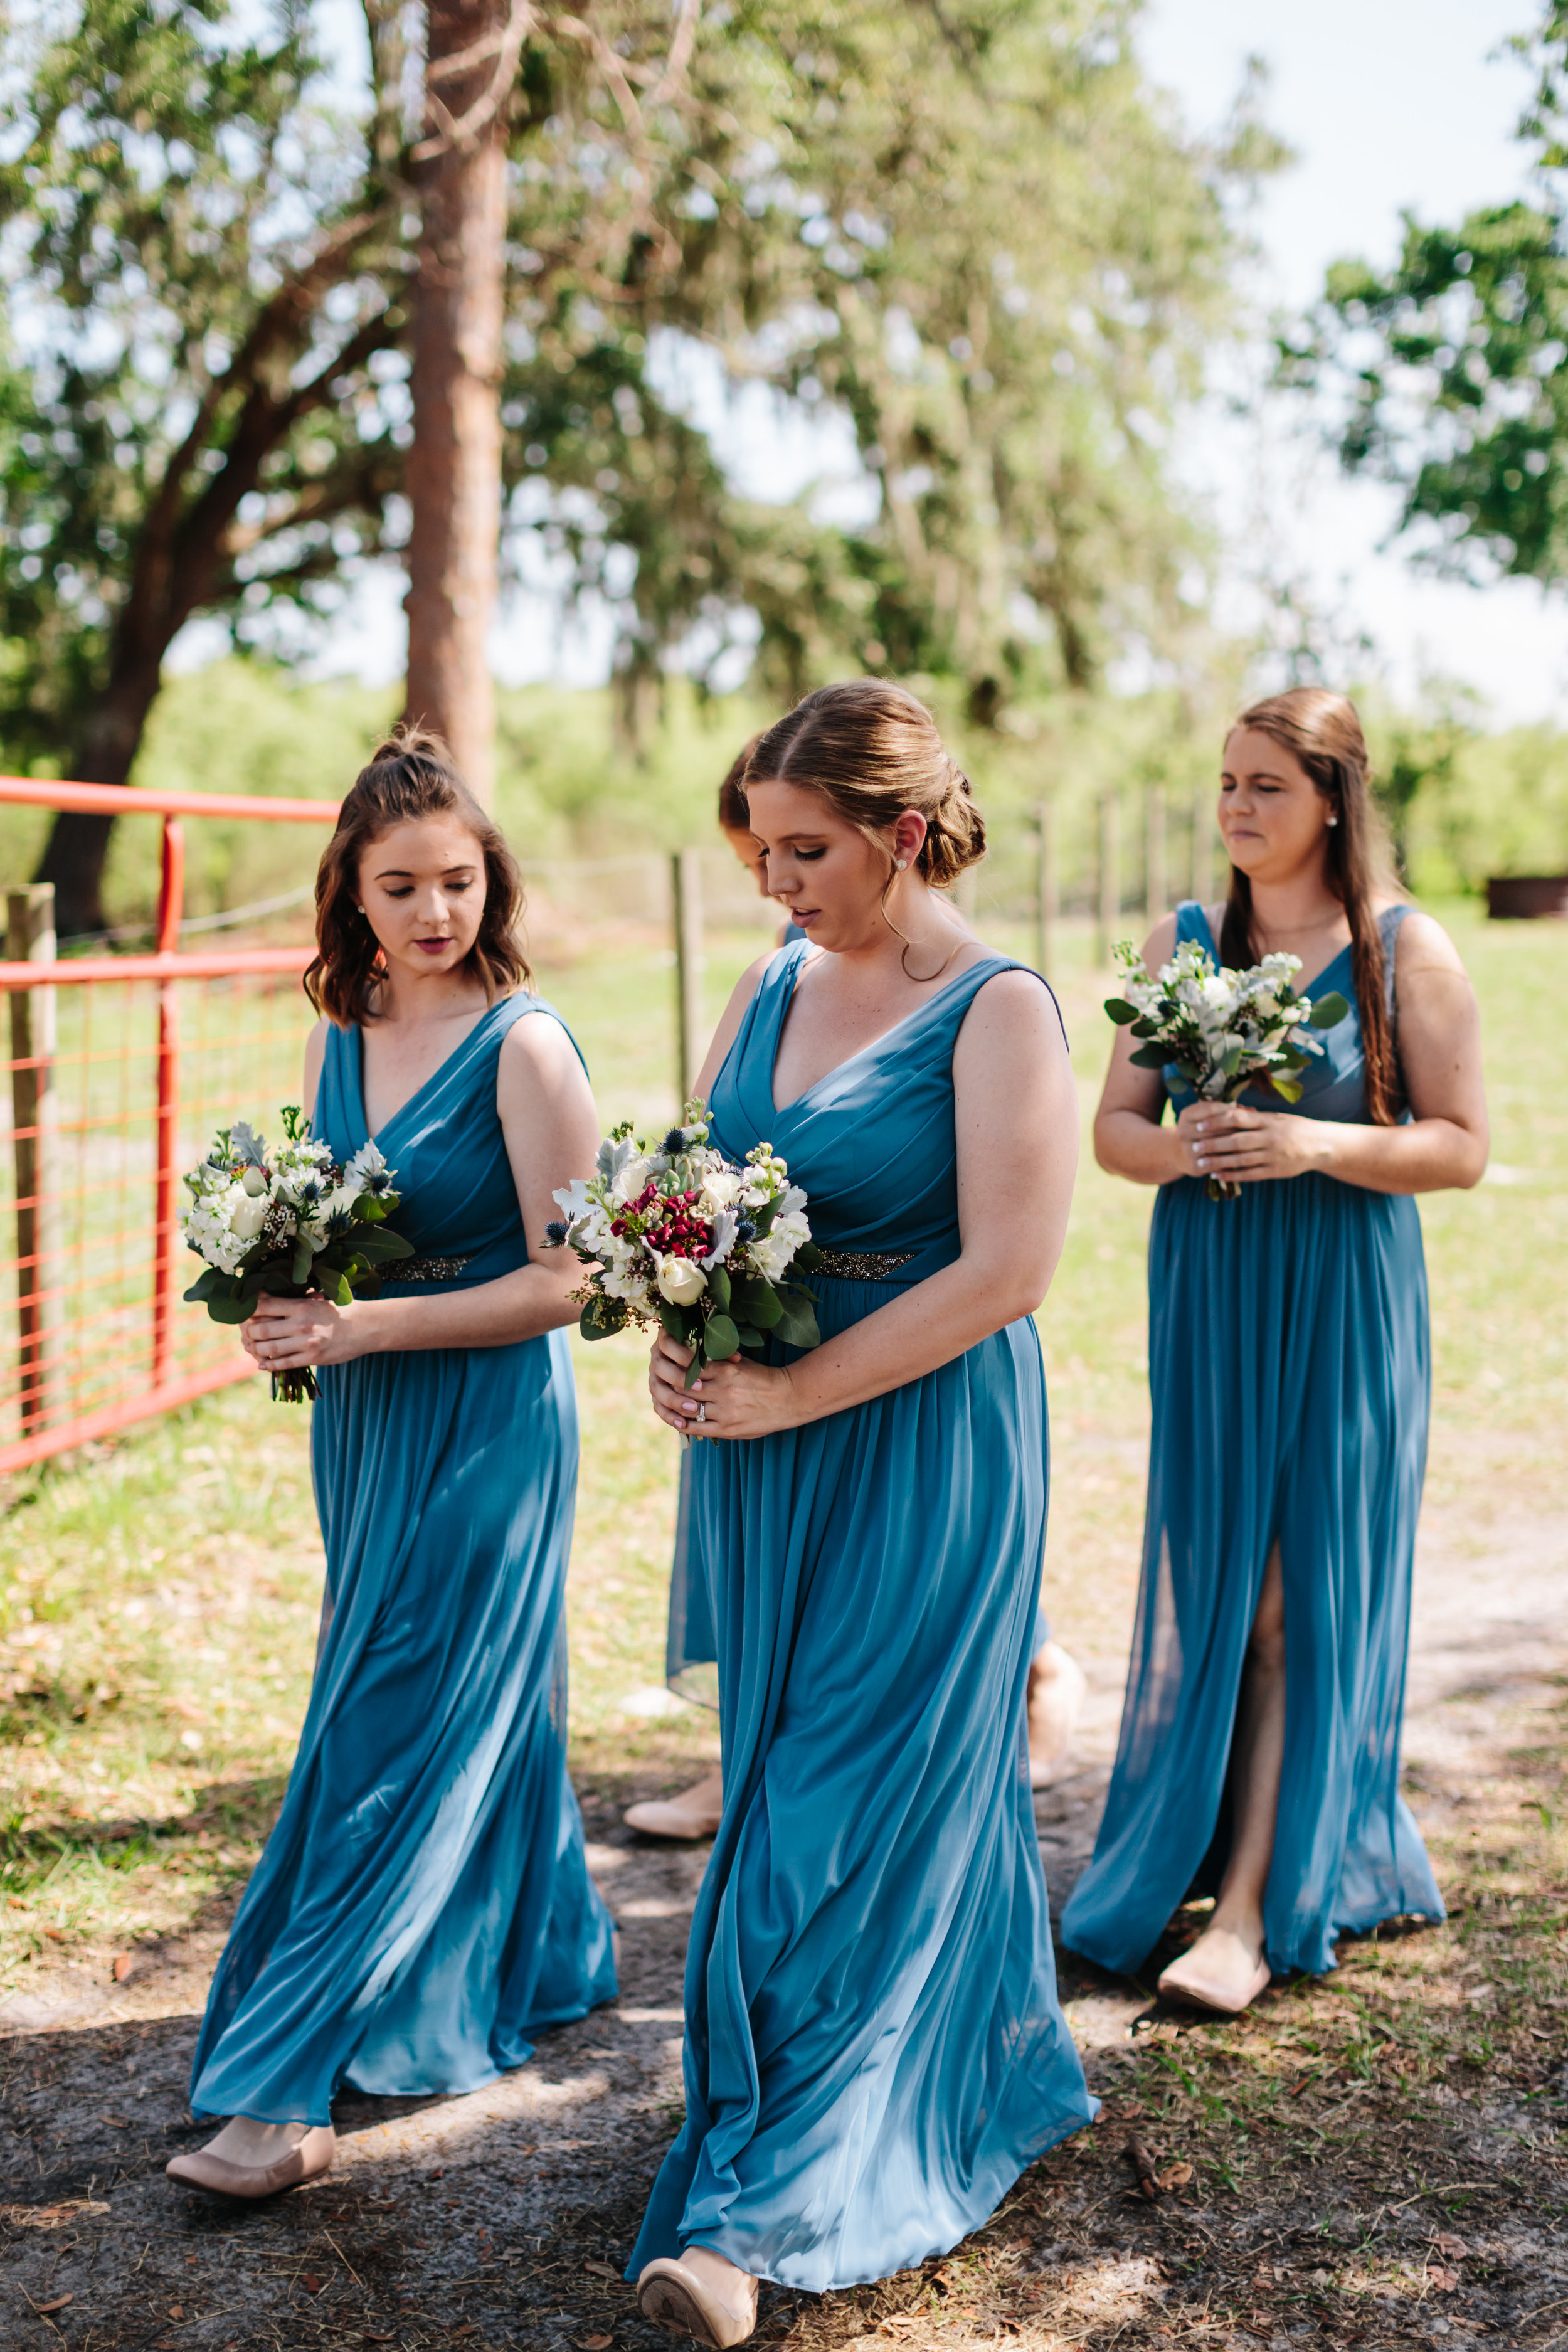 2018.04.14 Zak and Jamisyn Unrue Black Willow Barn Wedding Finals-244.jpg